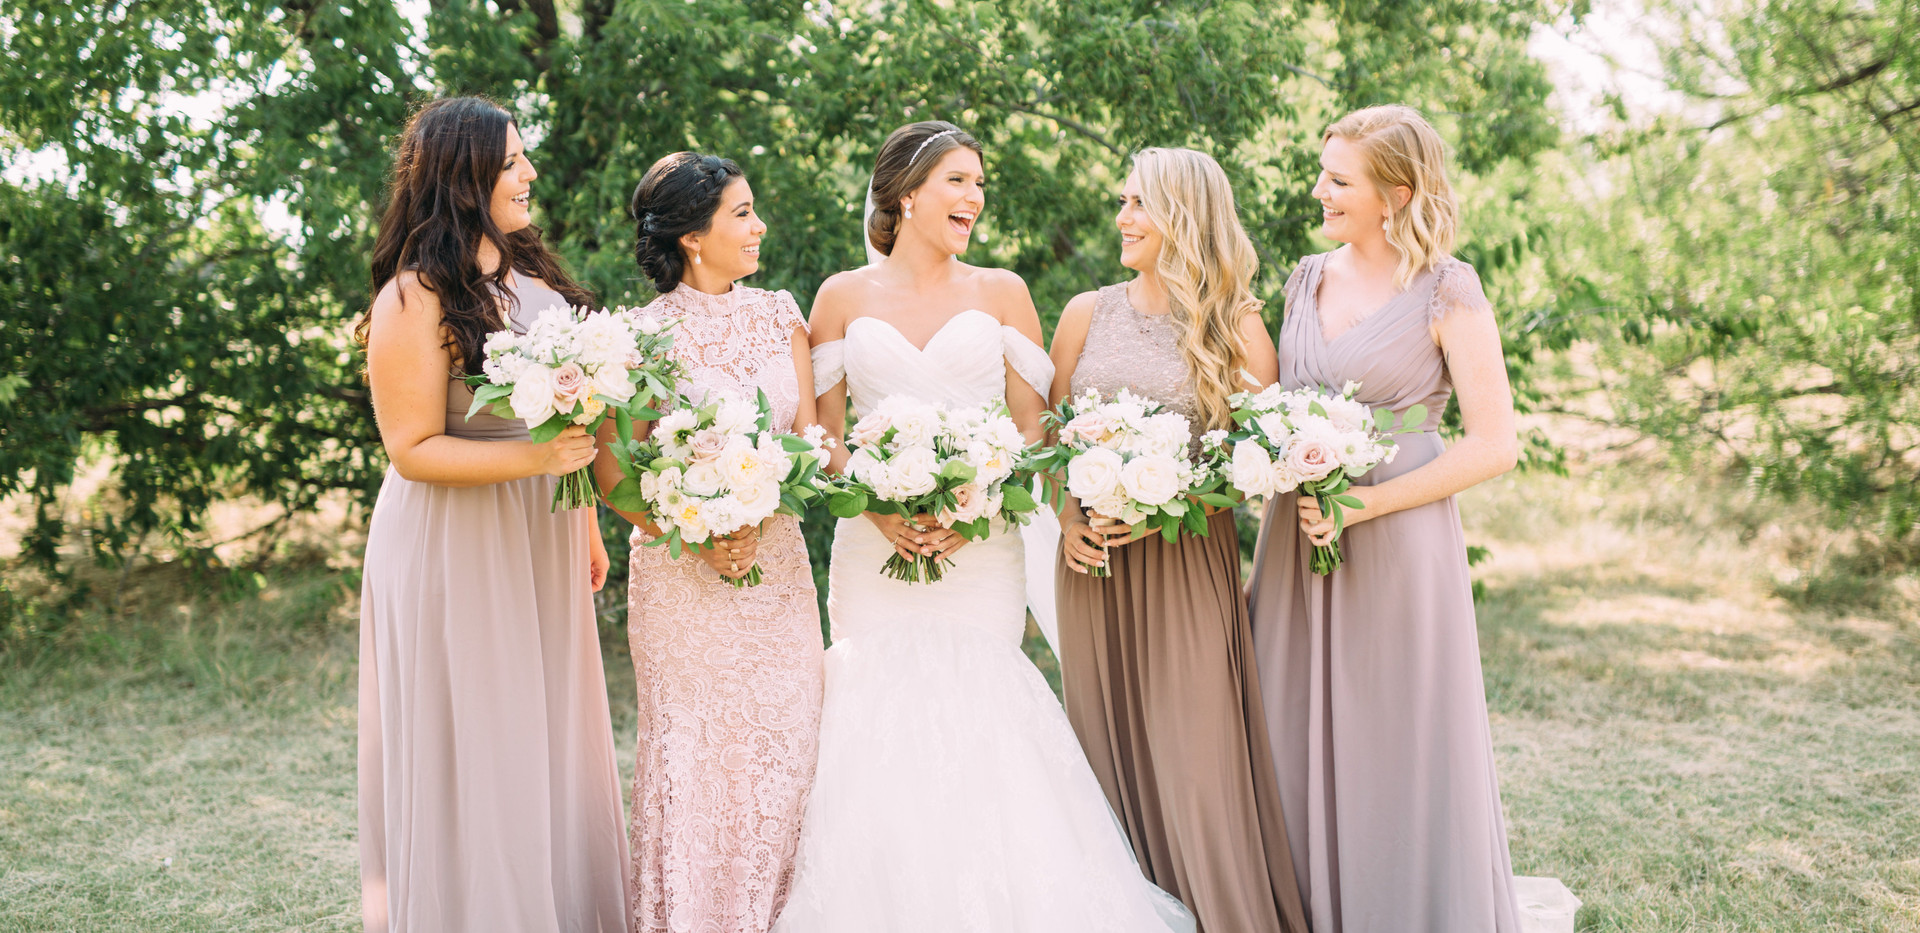 The Bridesmaids-0130.jpg